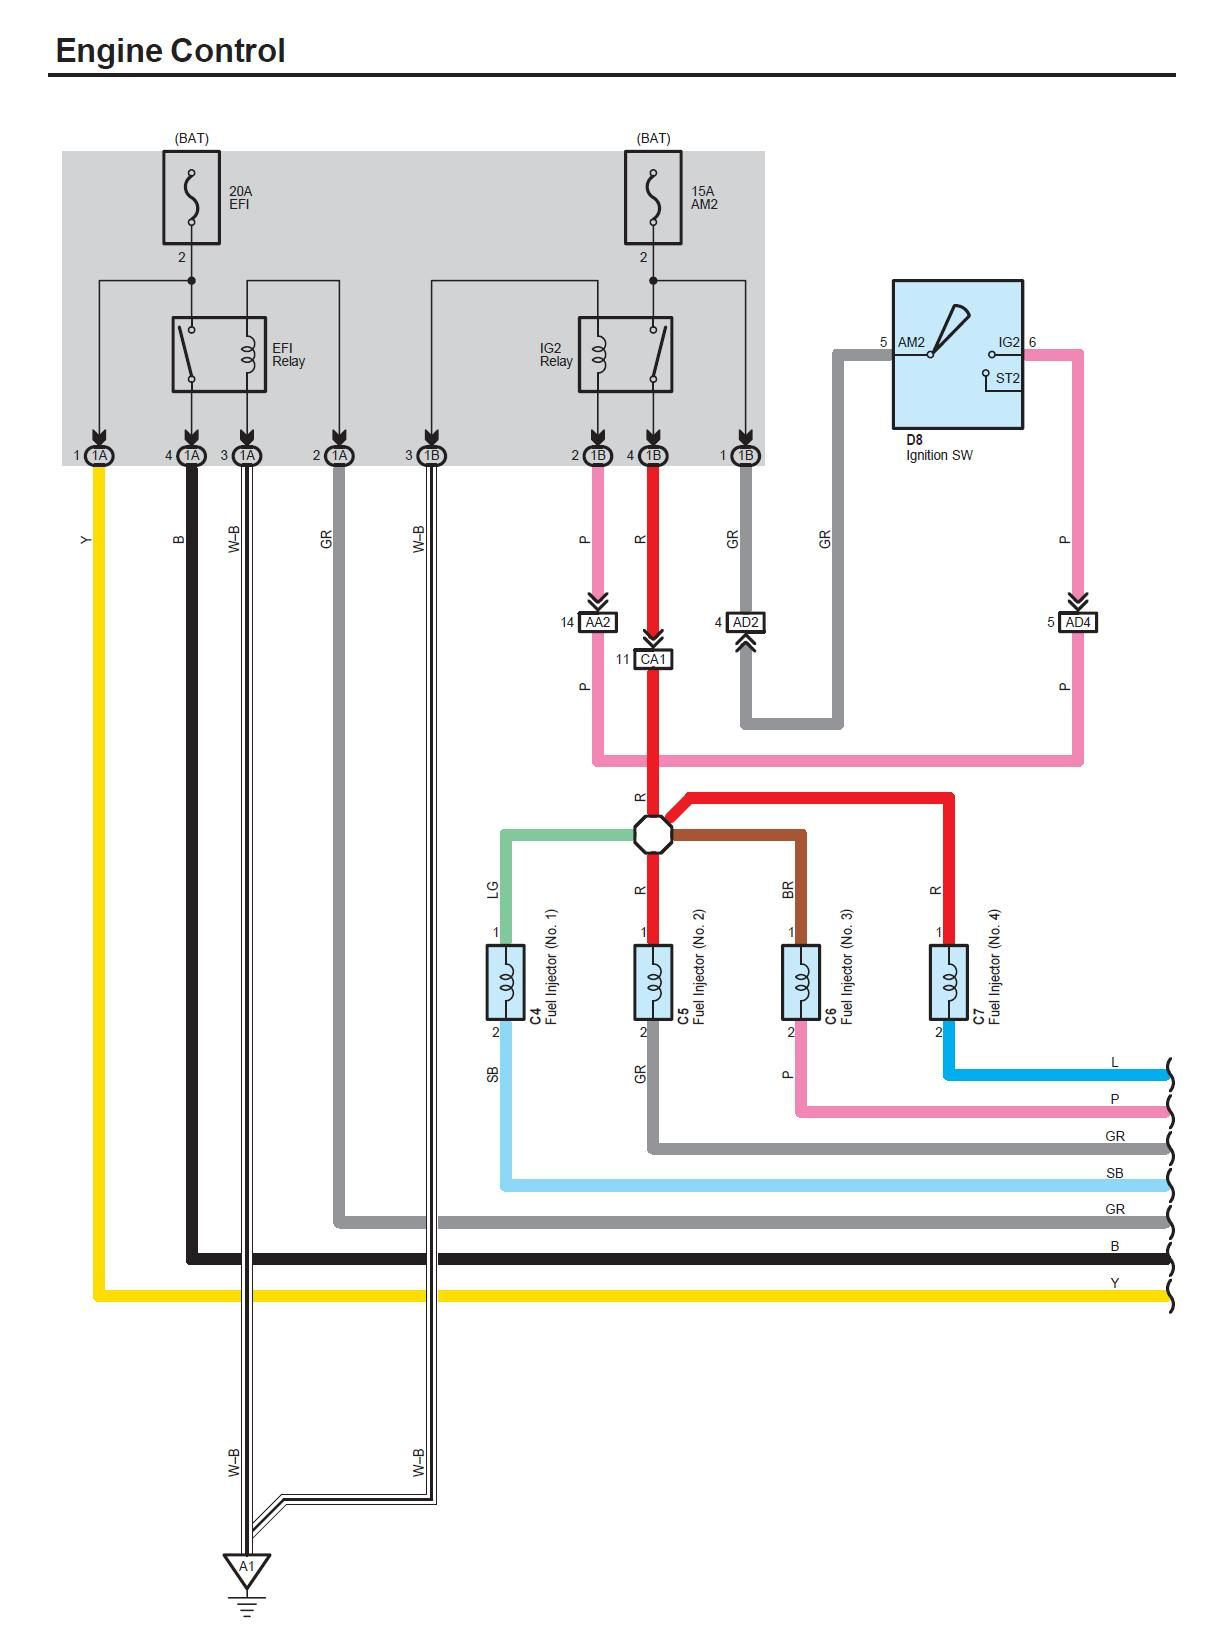 Toyota Engine Wiring Diagram | Adjusting My Ect Wiring Diagram |  | Wiring Diagram